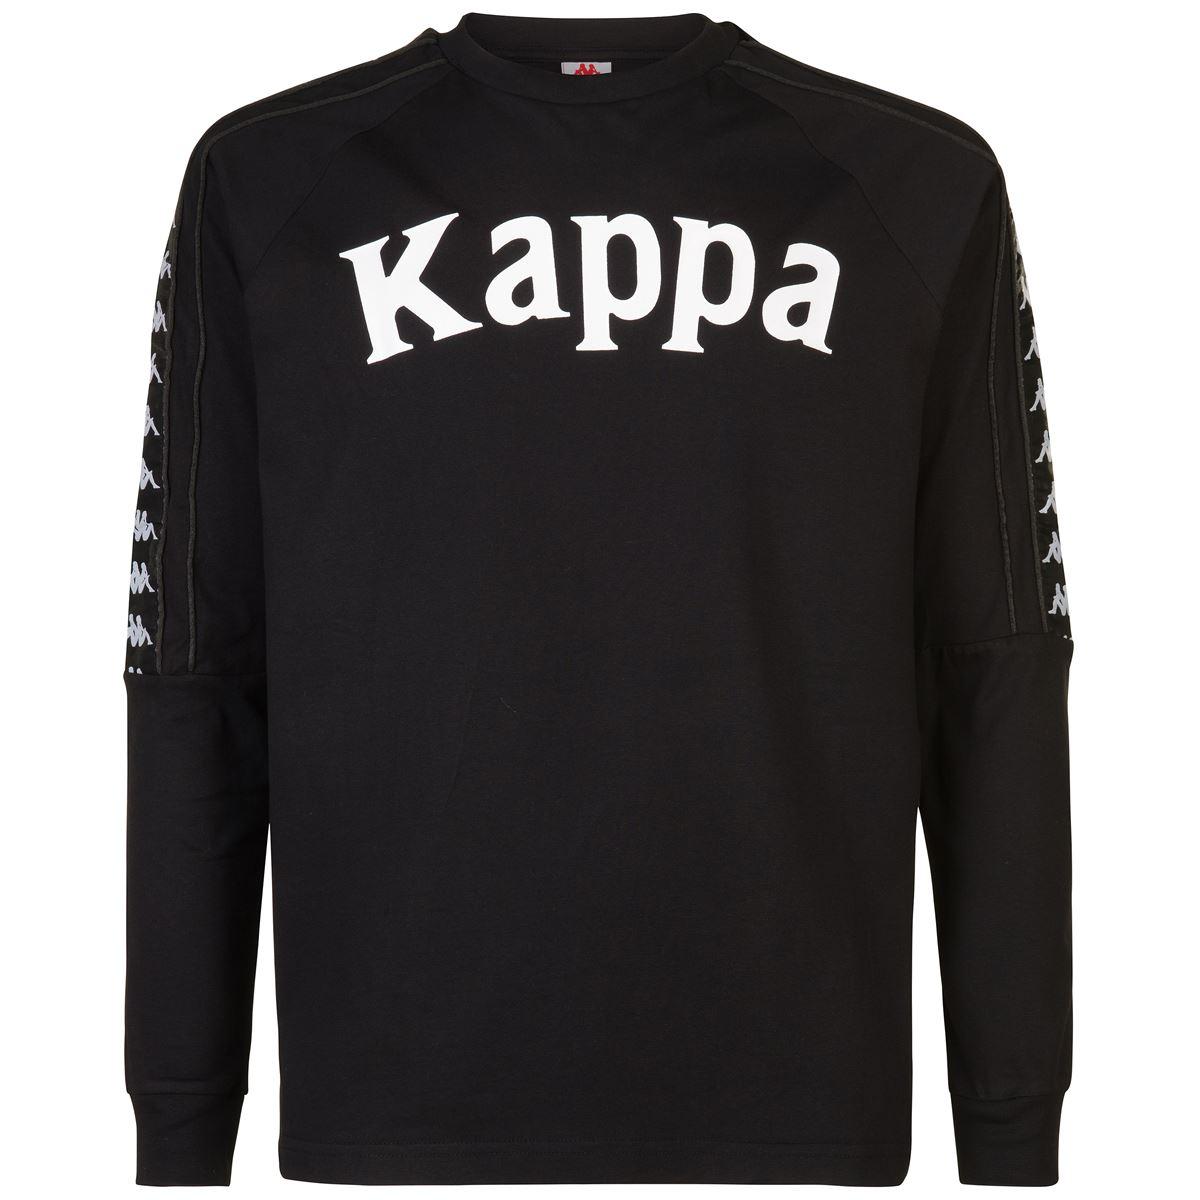 Kappa |  | 31119RWBY7 BLACK-WHITE